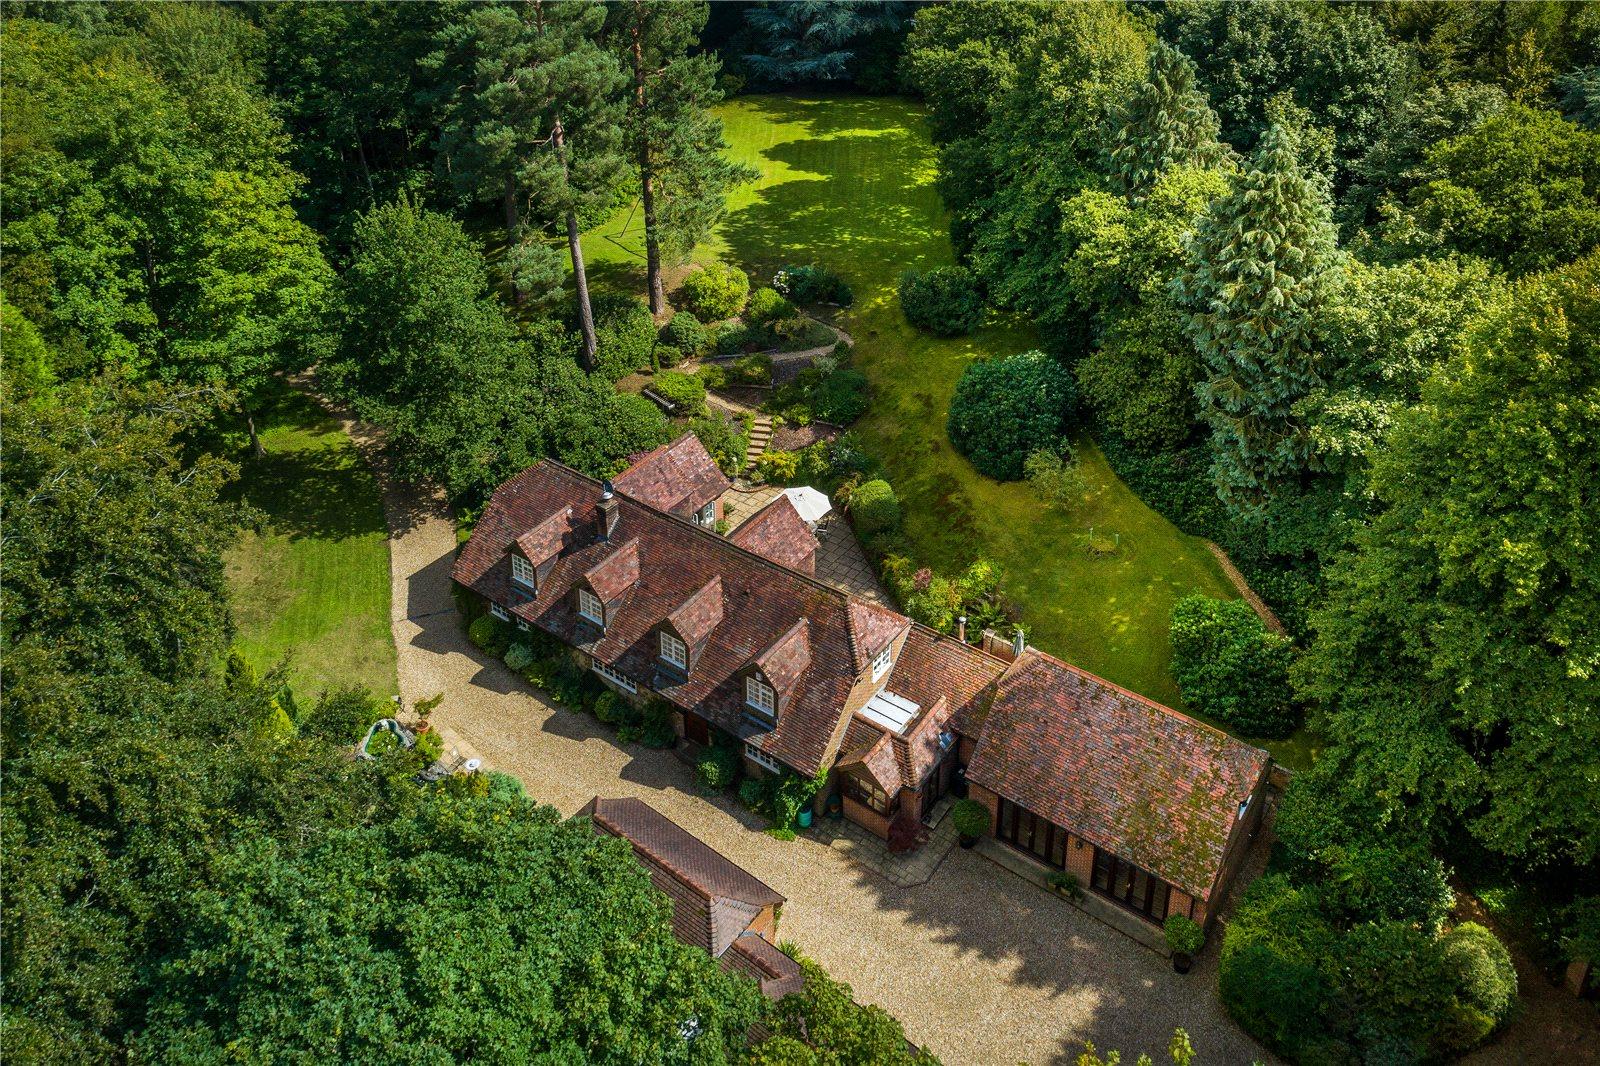 独户住宅 为 销售 在 Frensham Lane, Churt, Farnham, Surrey, GU10 Farnham, 英格兰